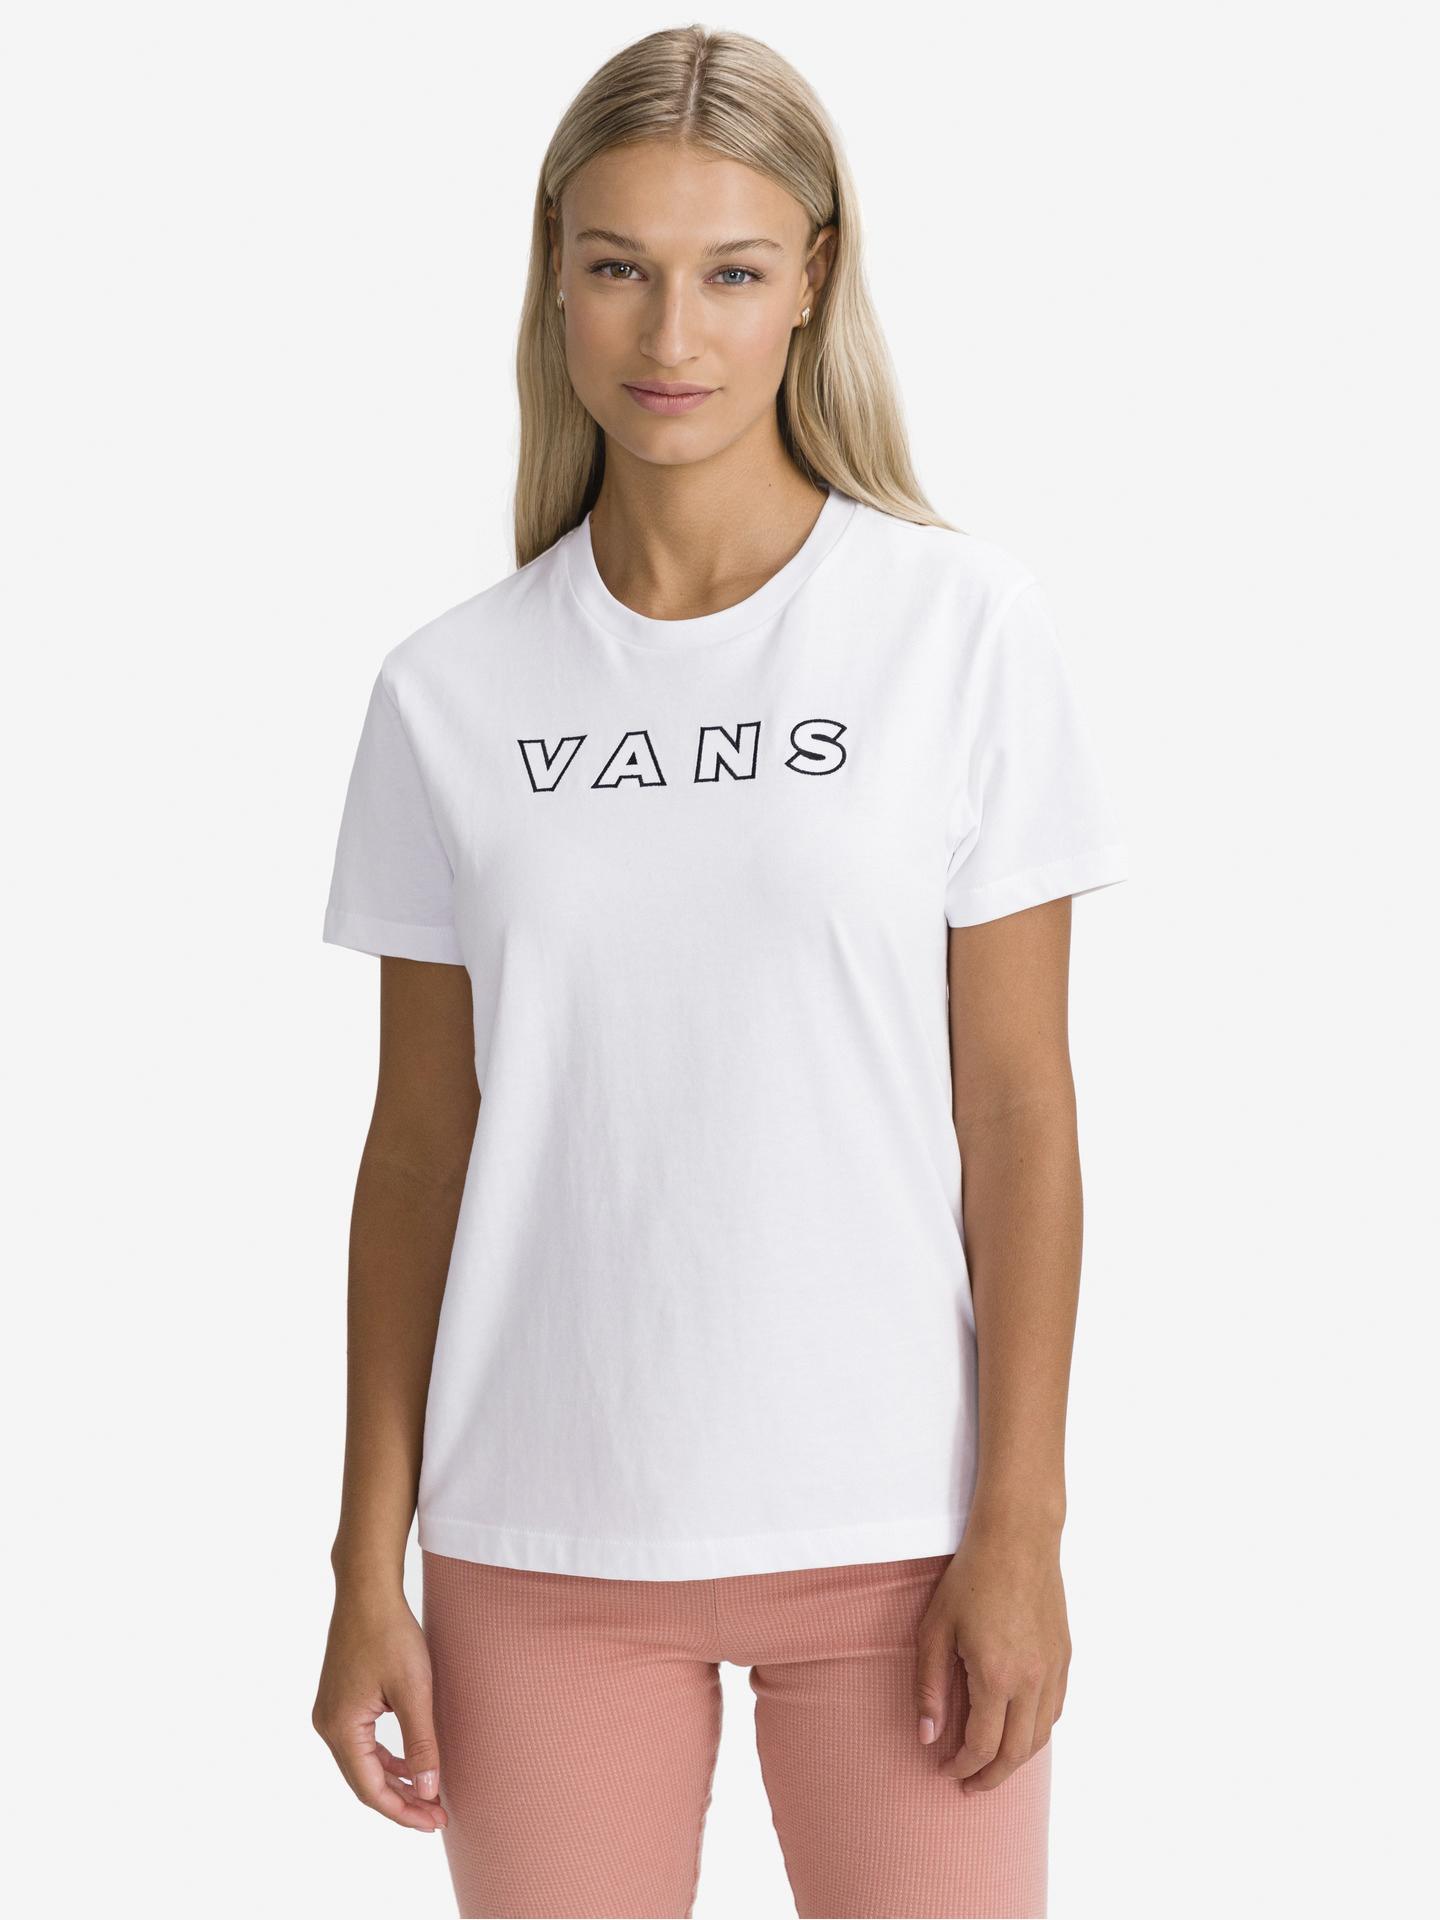 Vans bianco maglietta Well Suited